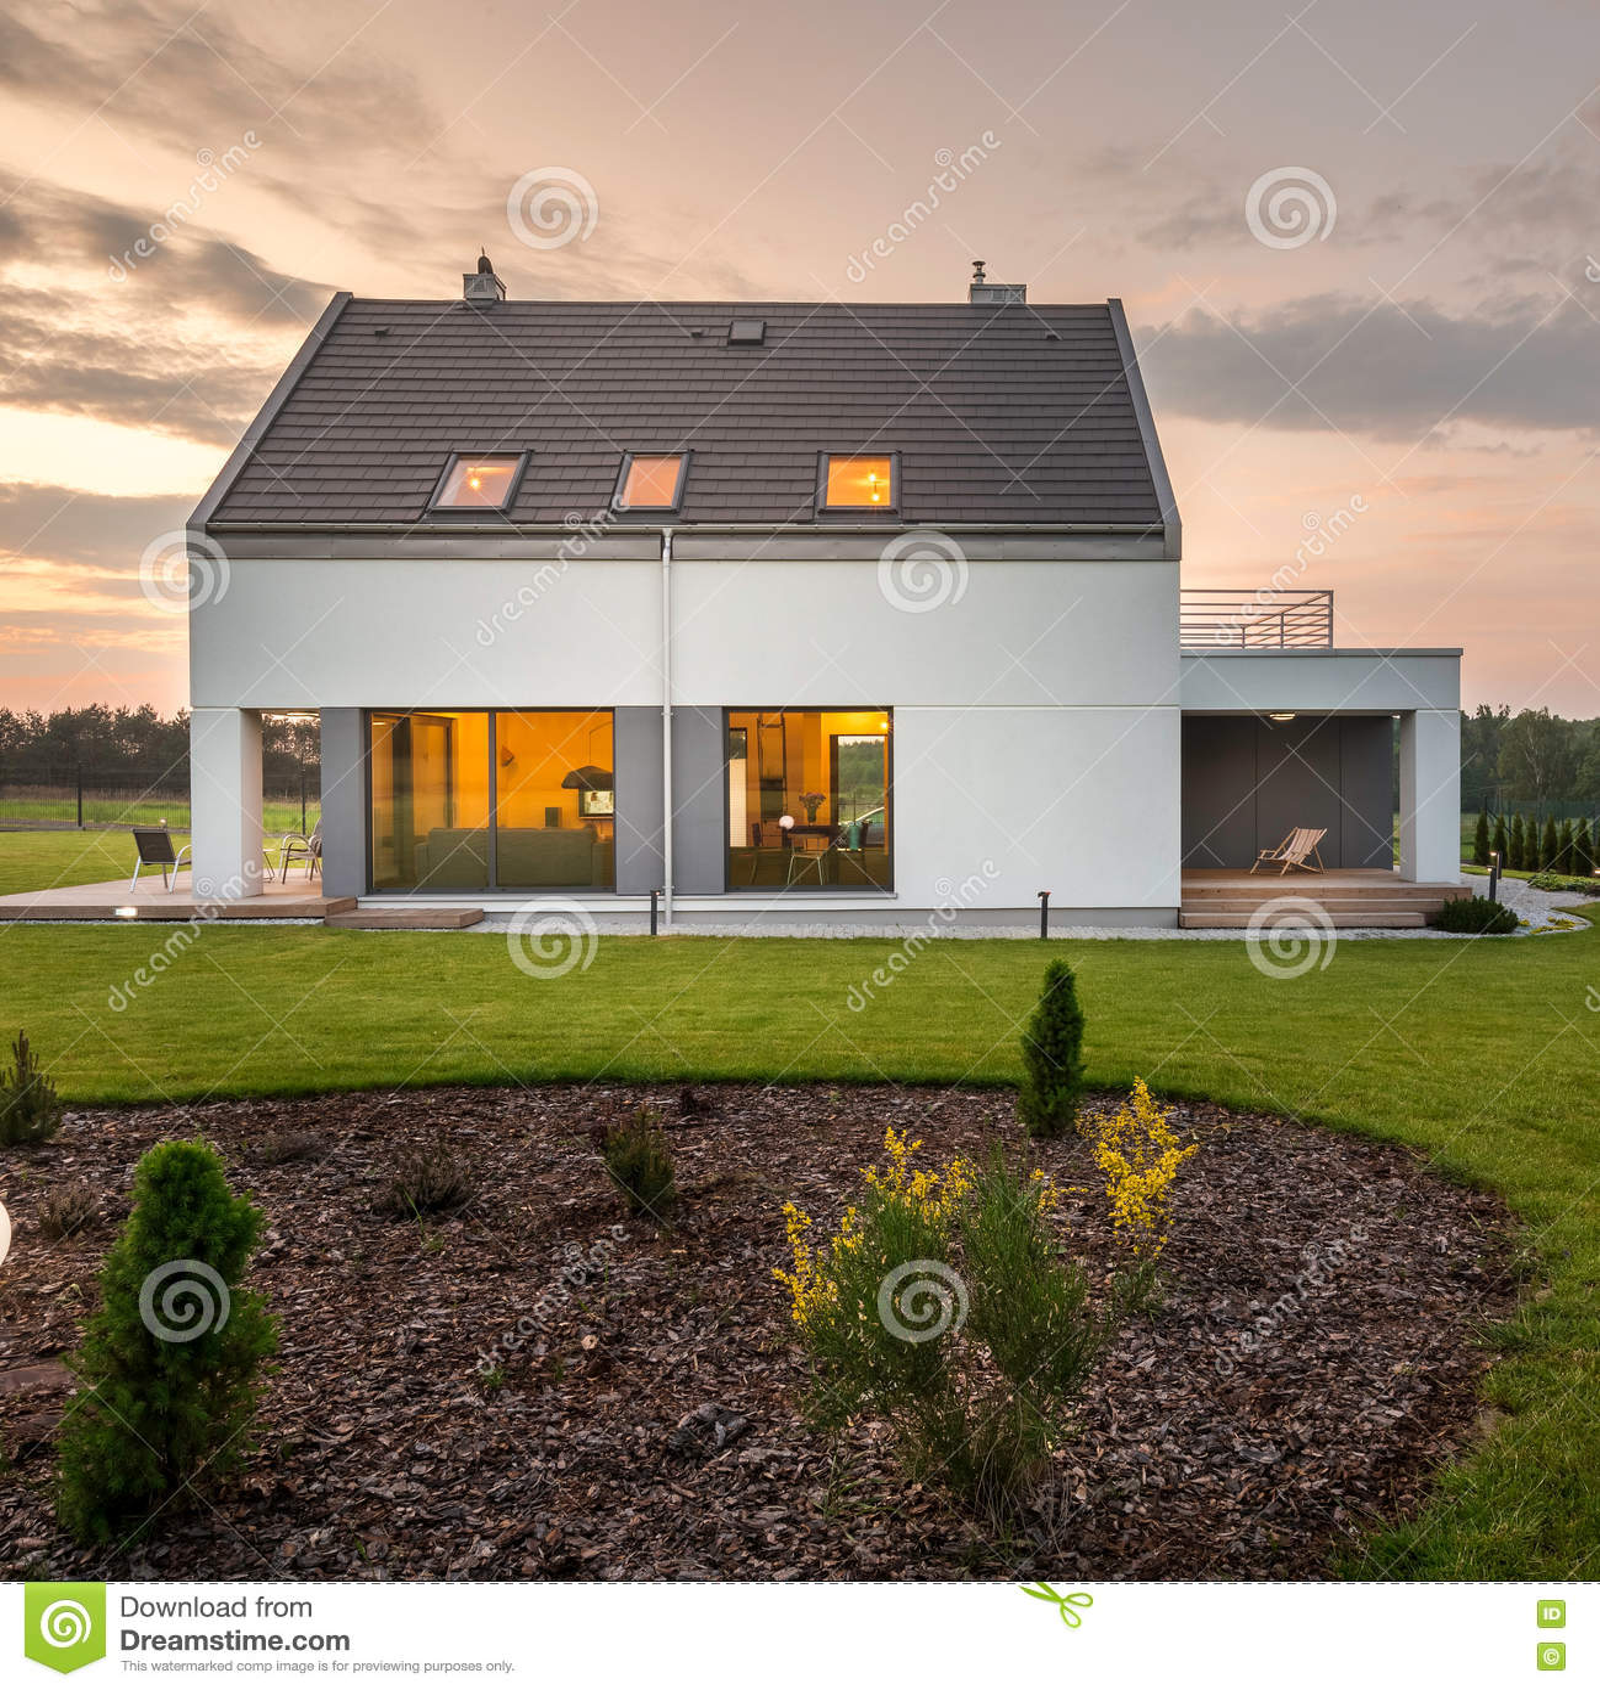 Elegant and modern house with backyard